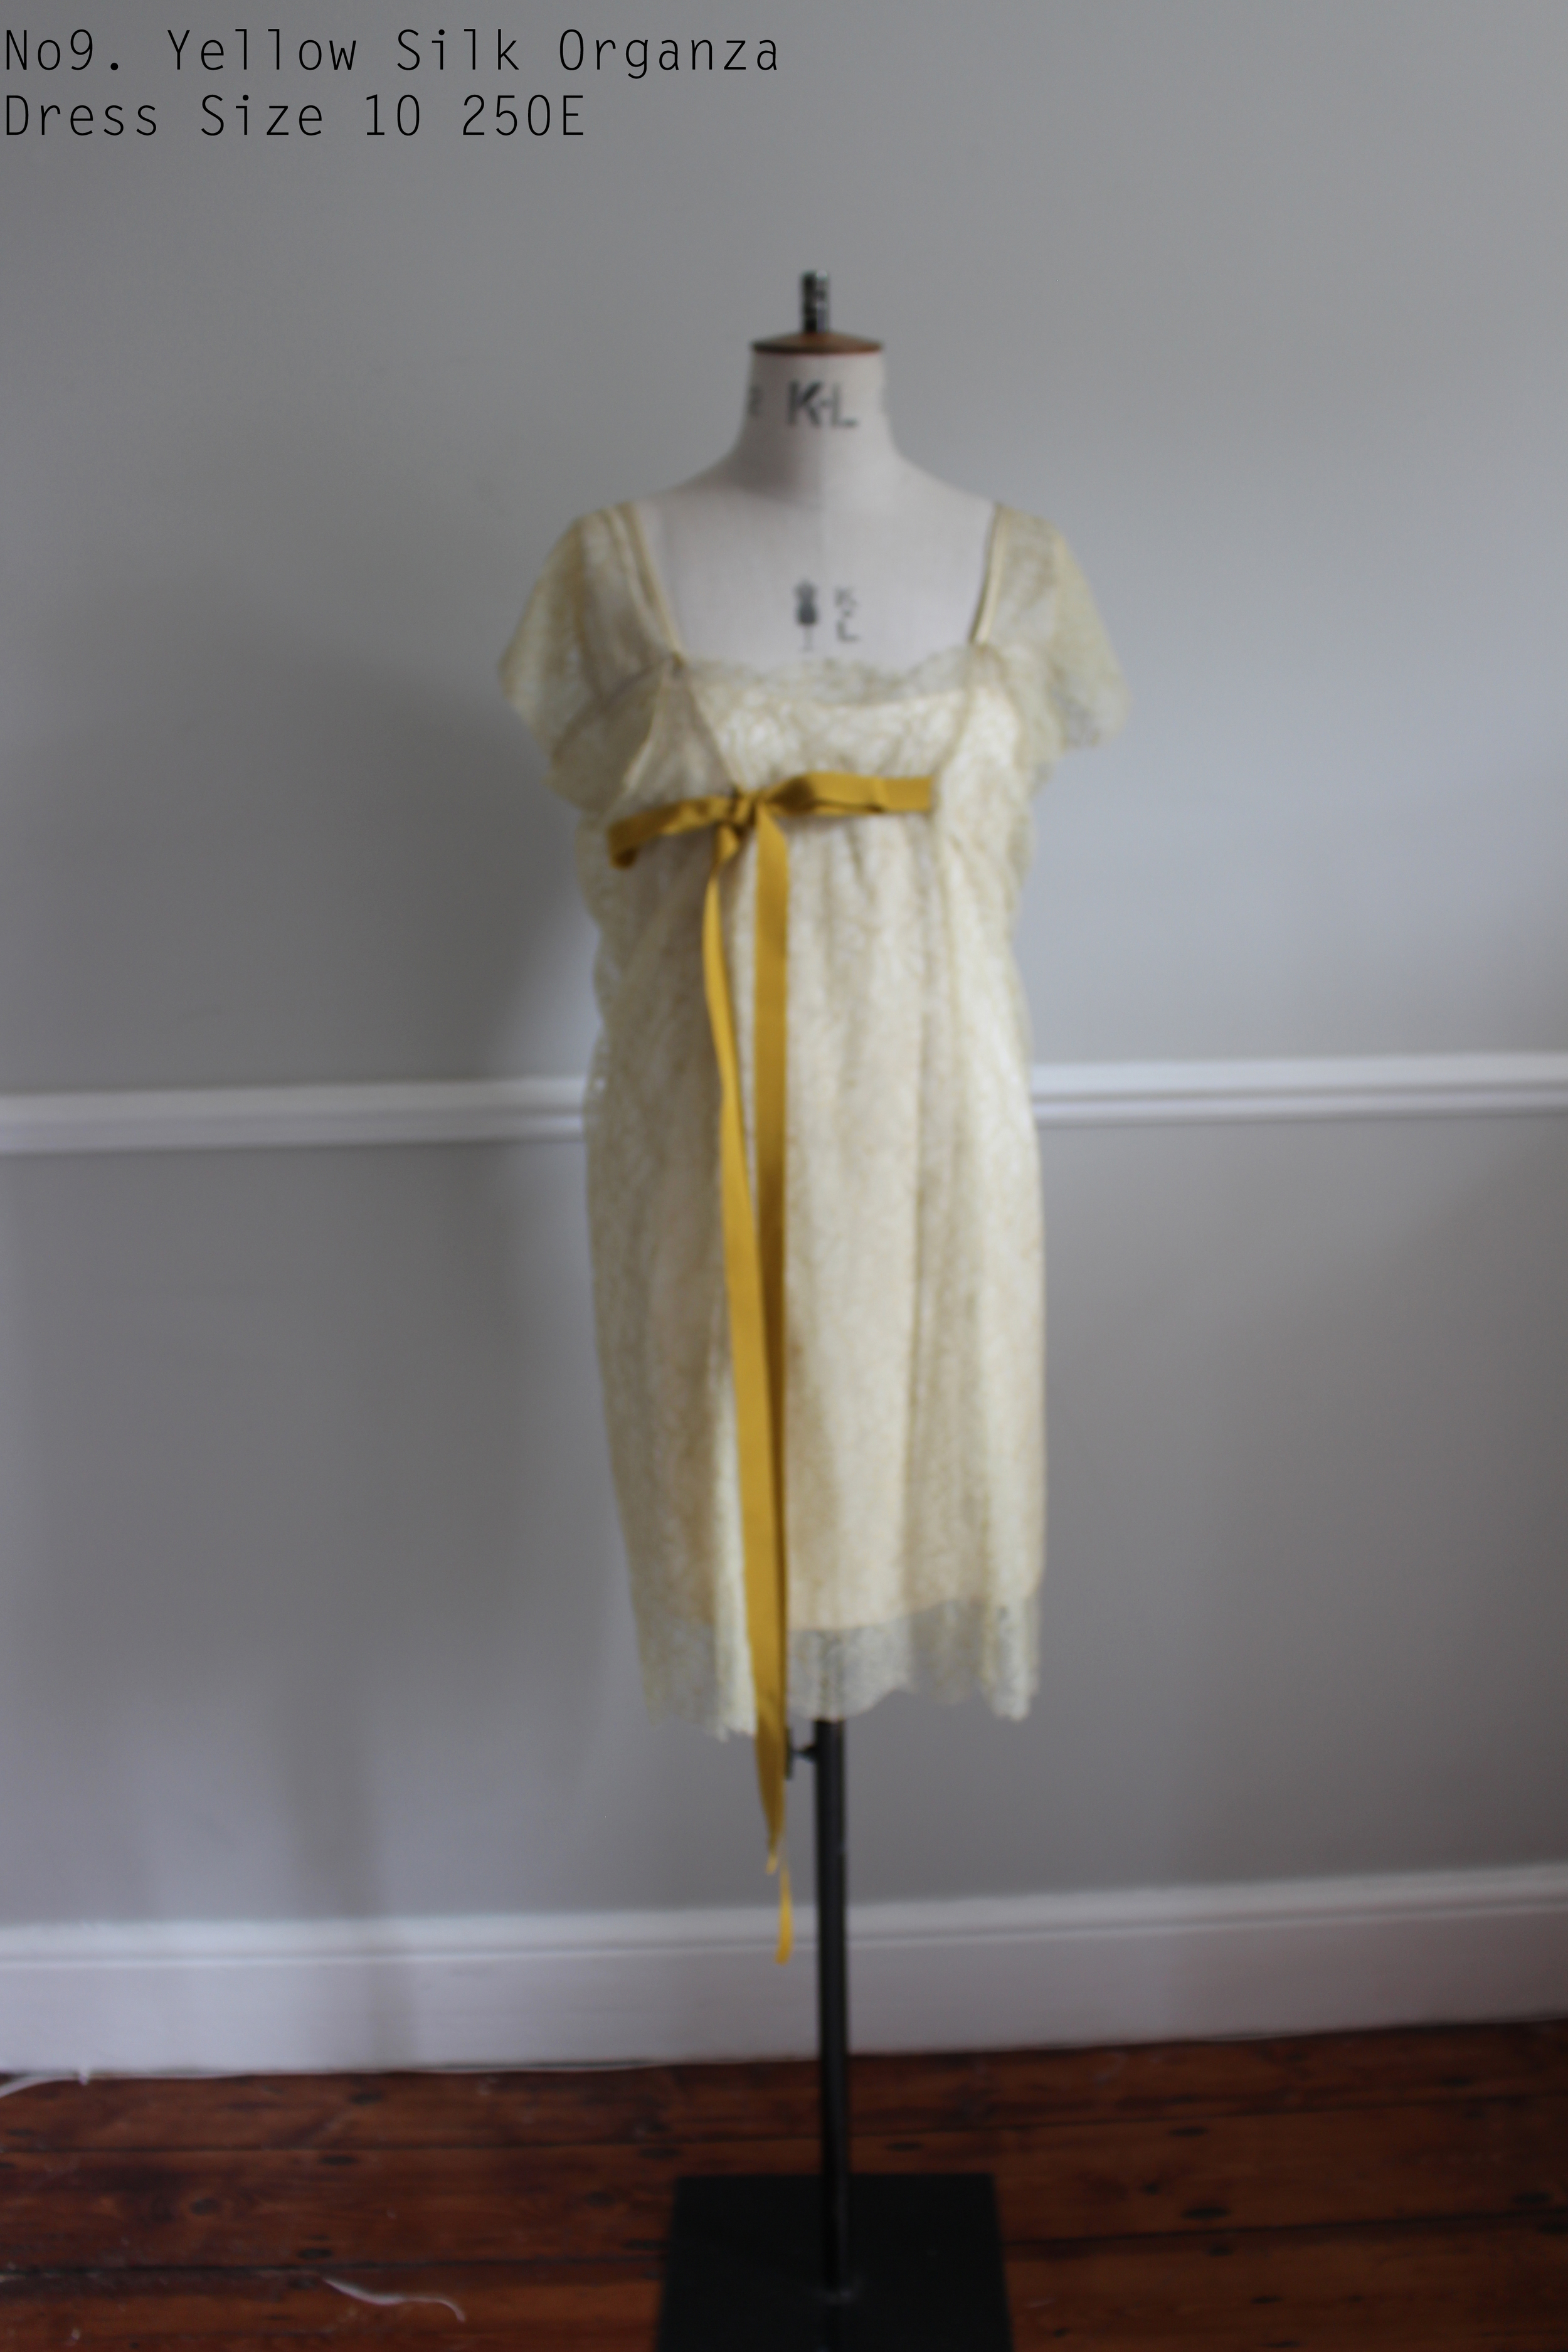 No10. Layered Calias Lace Dress Size 10 250E.jpg